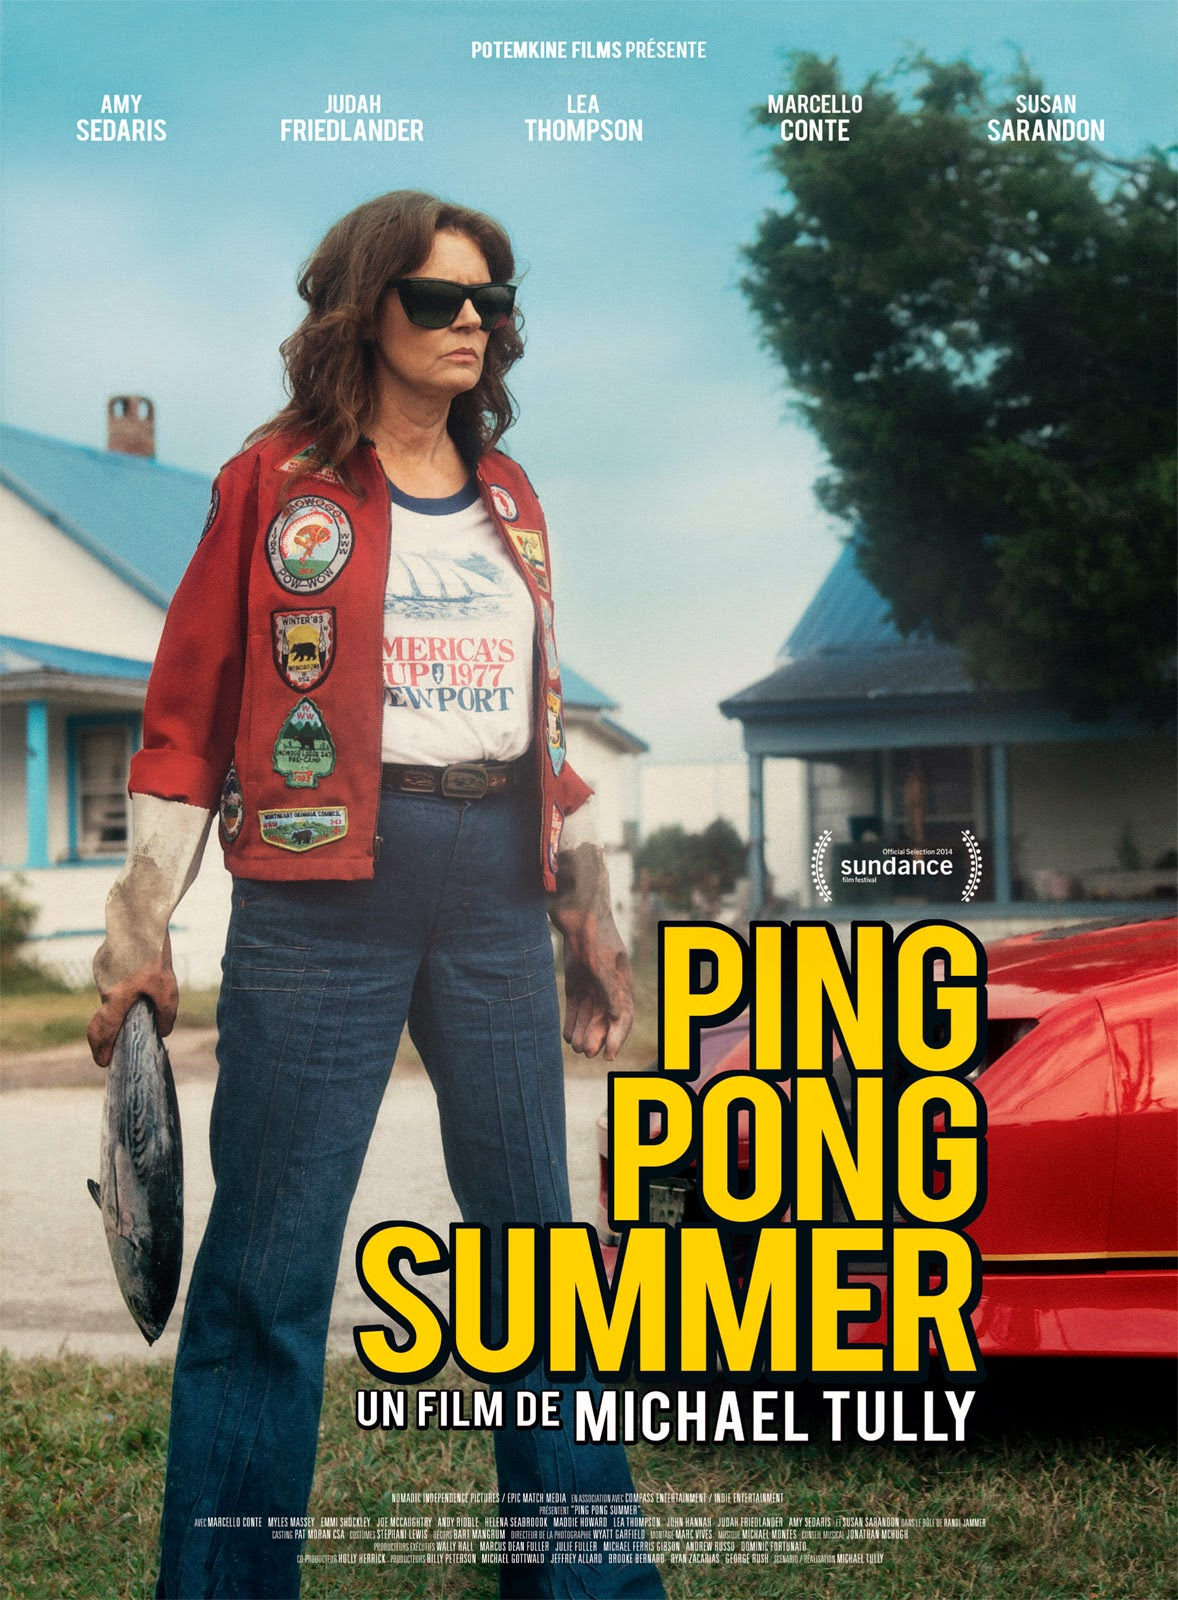 Ping Pong Summer Teaser Trailer